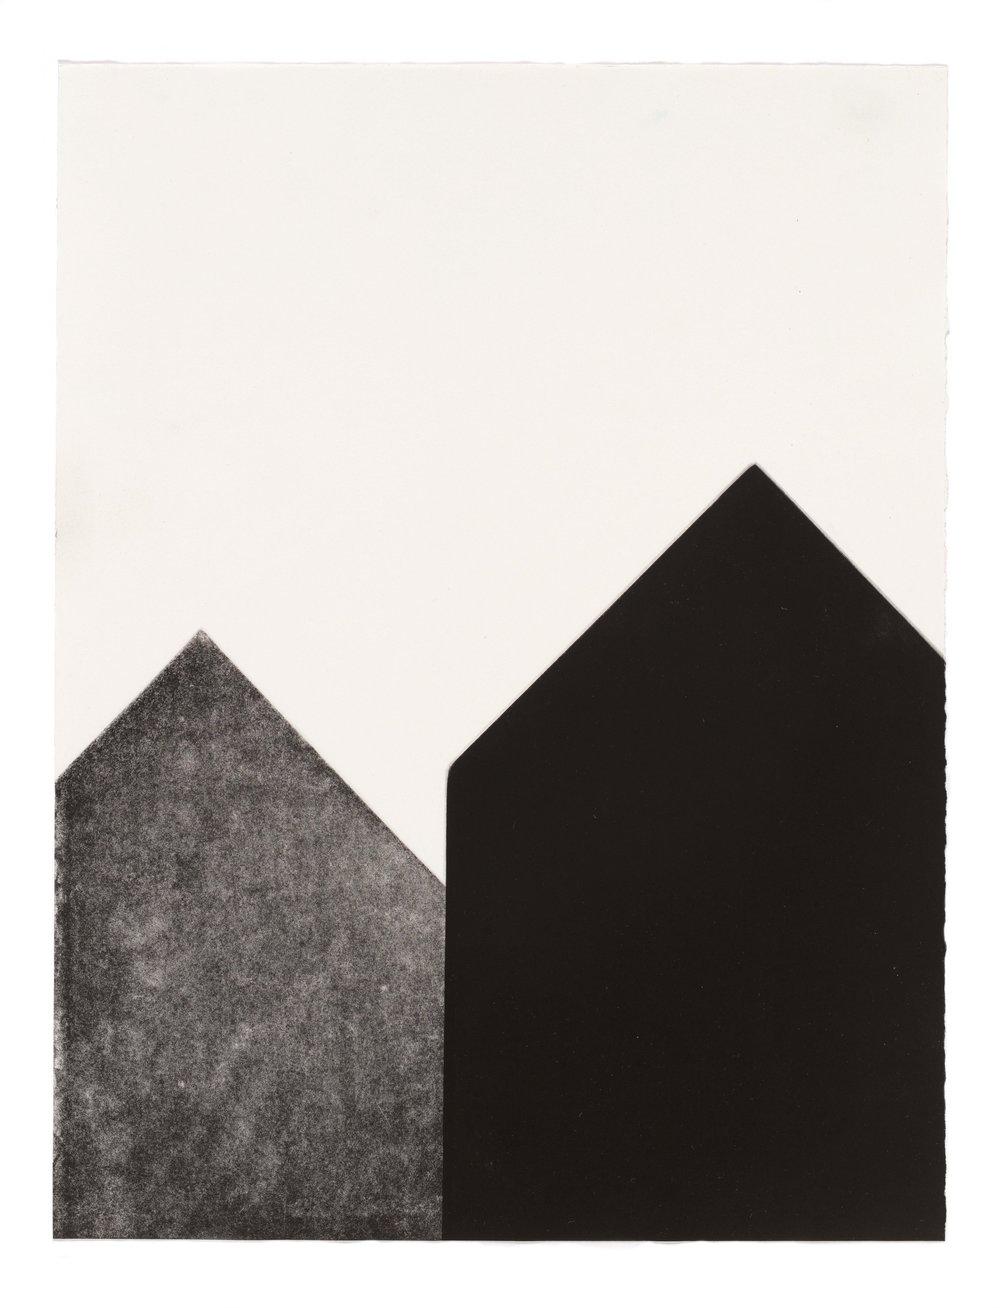 Close to you, multi-plate aquatint, 28.5 x 37.5cm, 2017